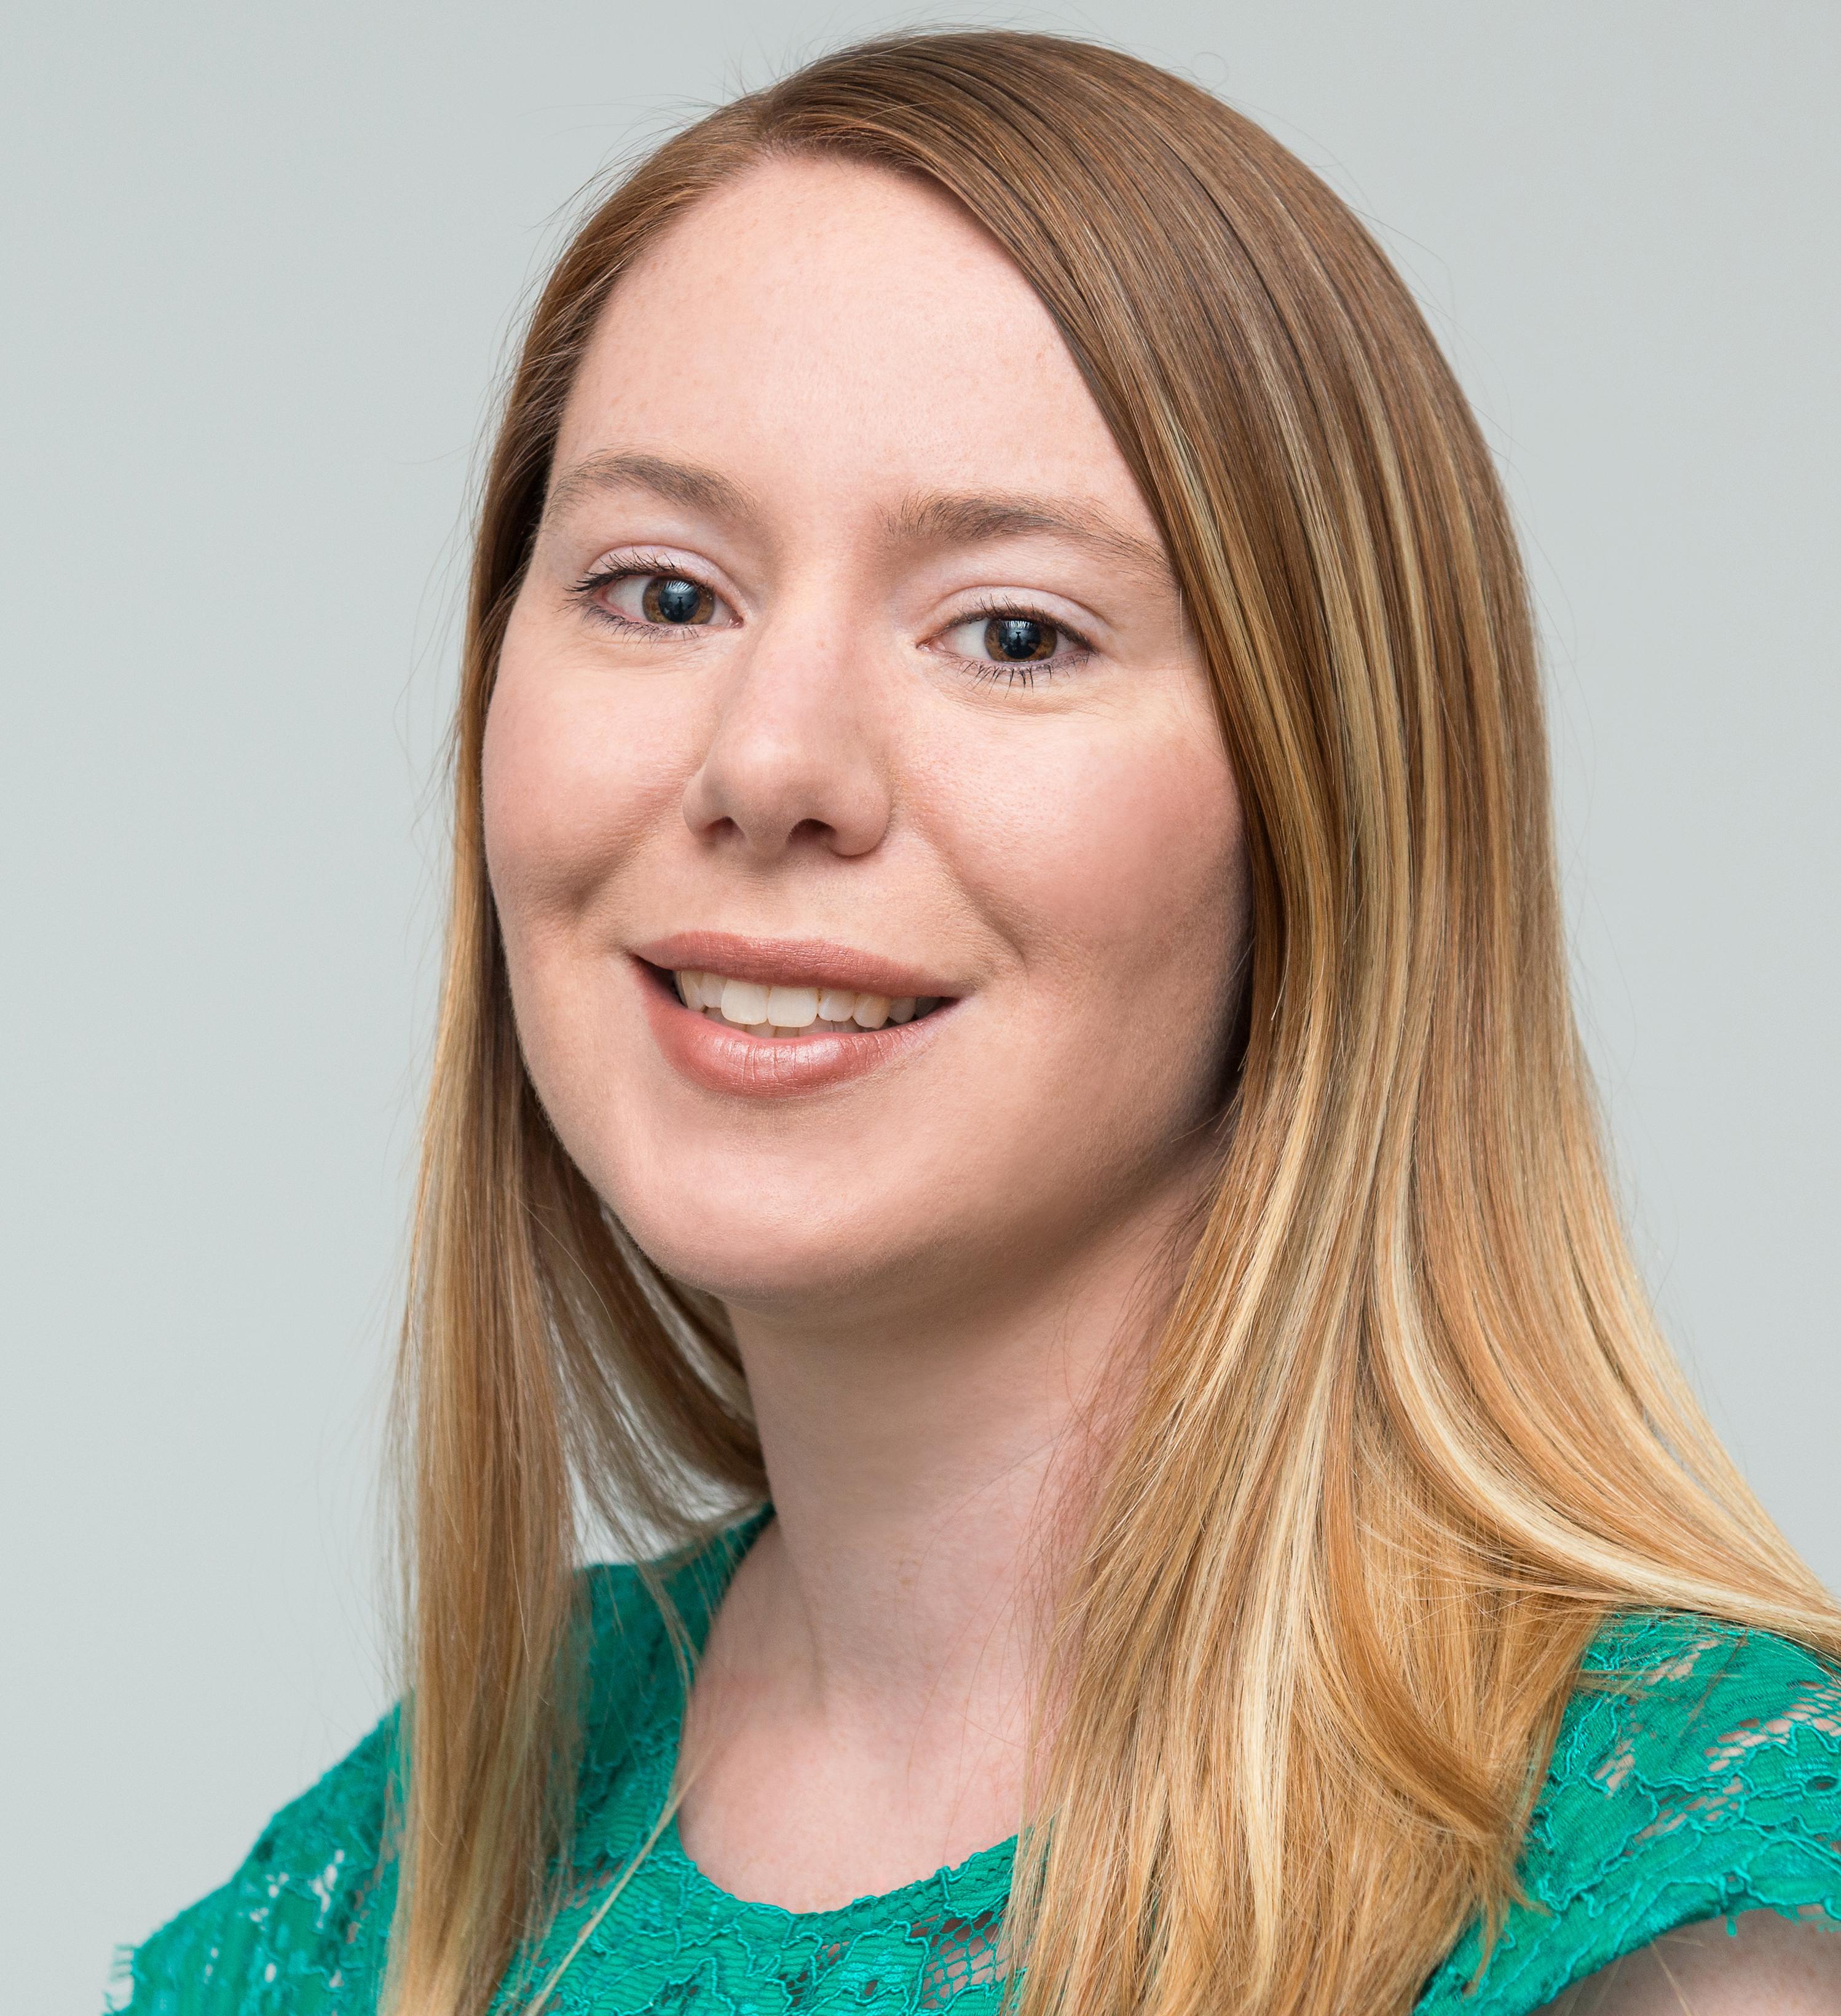 Director of Sales - Ingrid